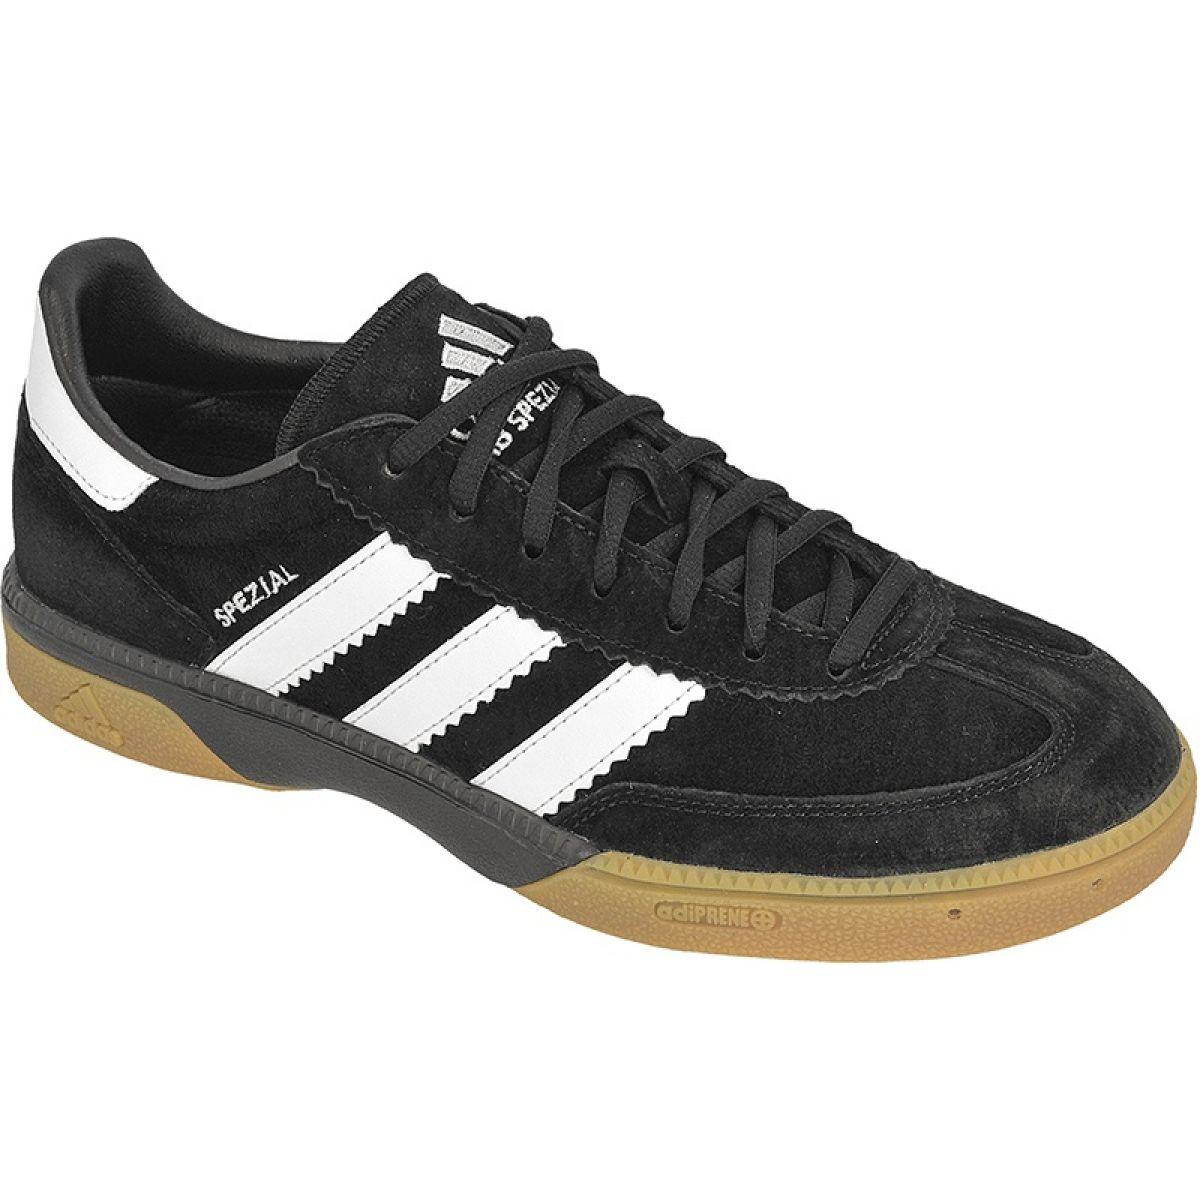 adidas handball shoes men 2018